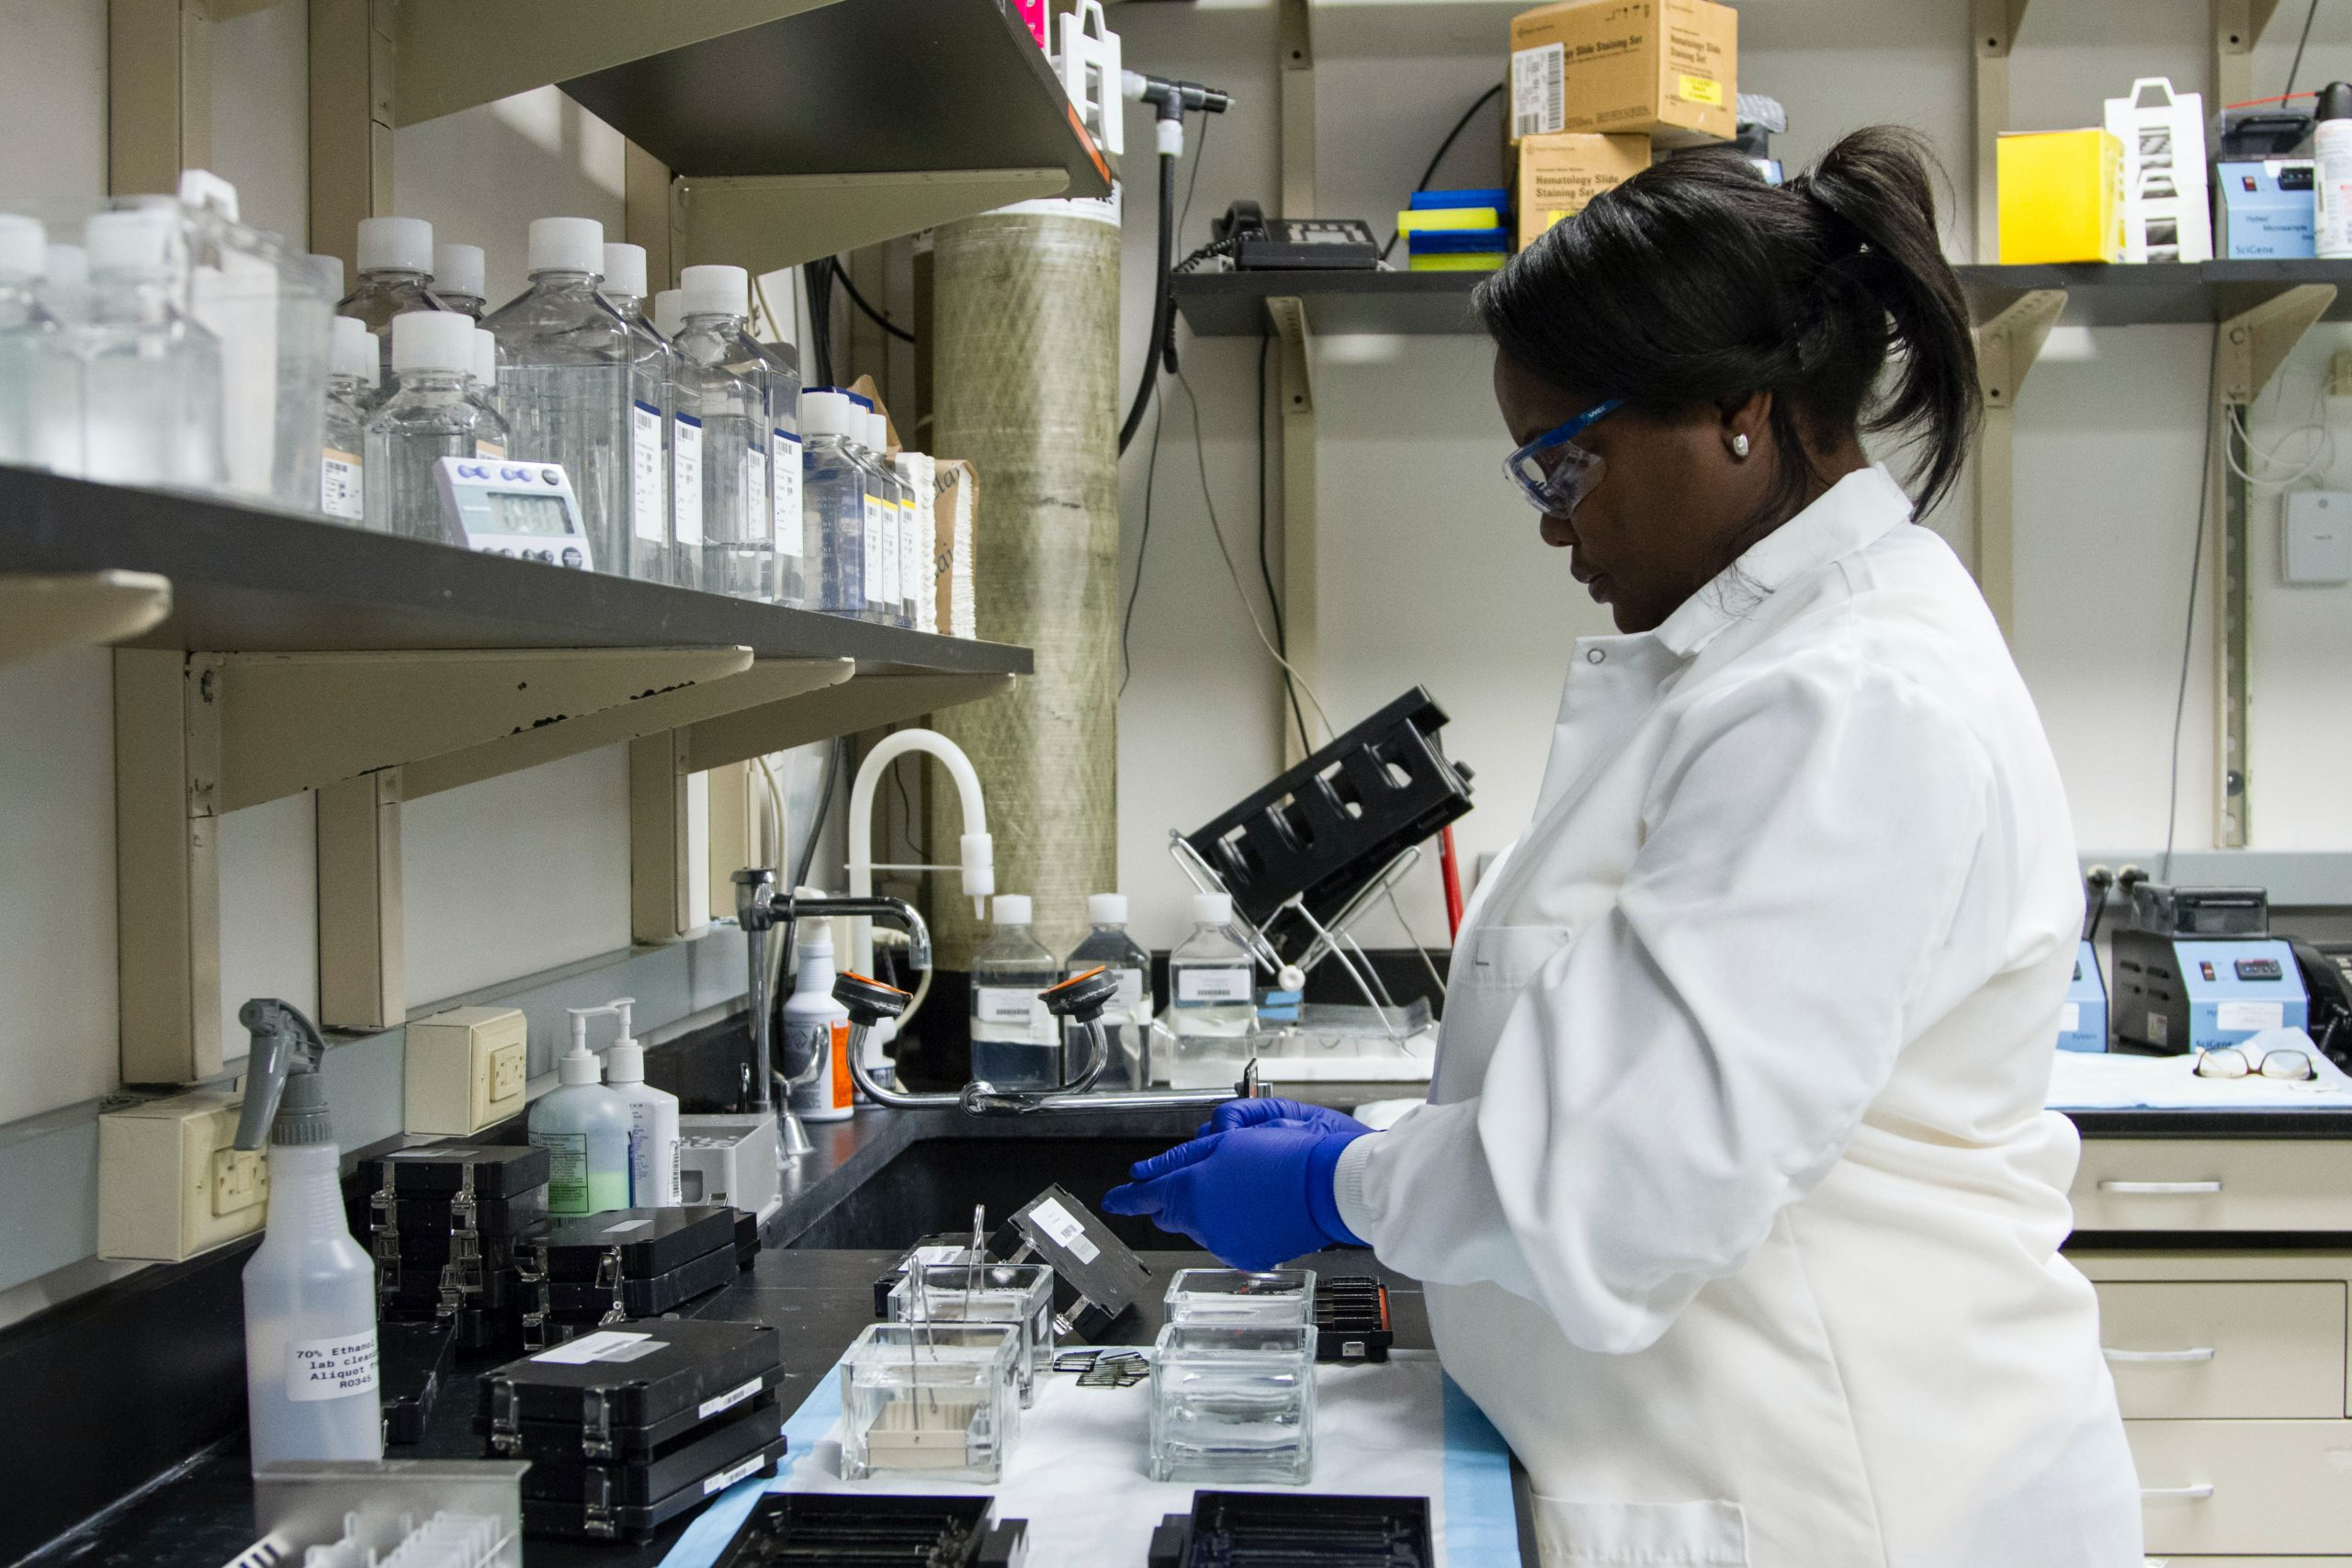 Black female scientist in lab doing fibroids research